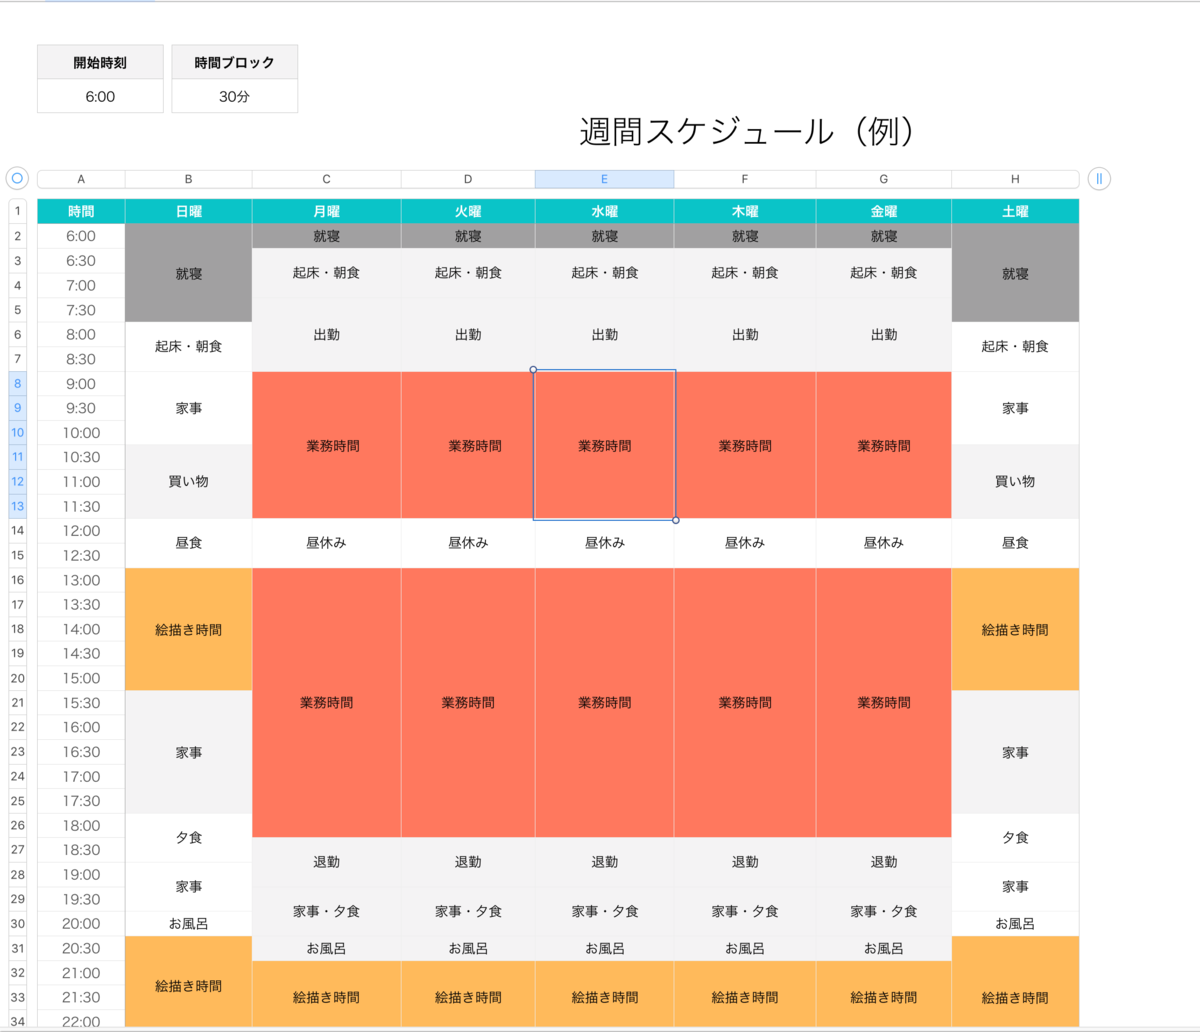 f:id:kensasuga2018:20200225215232p:plain